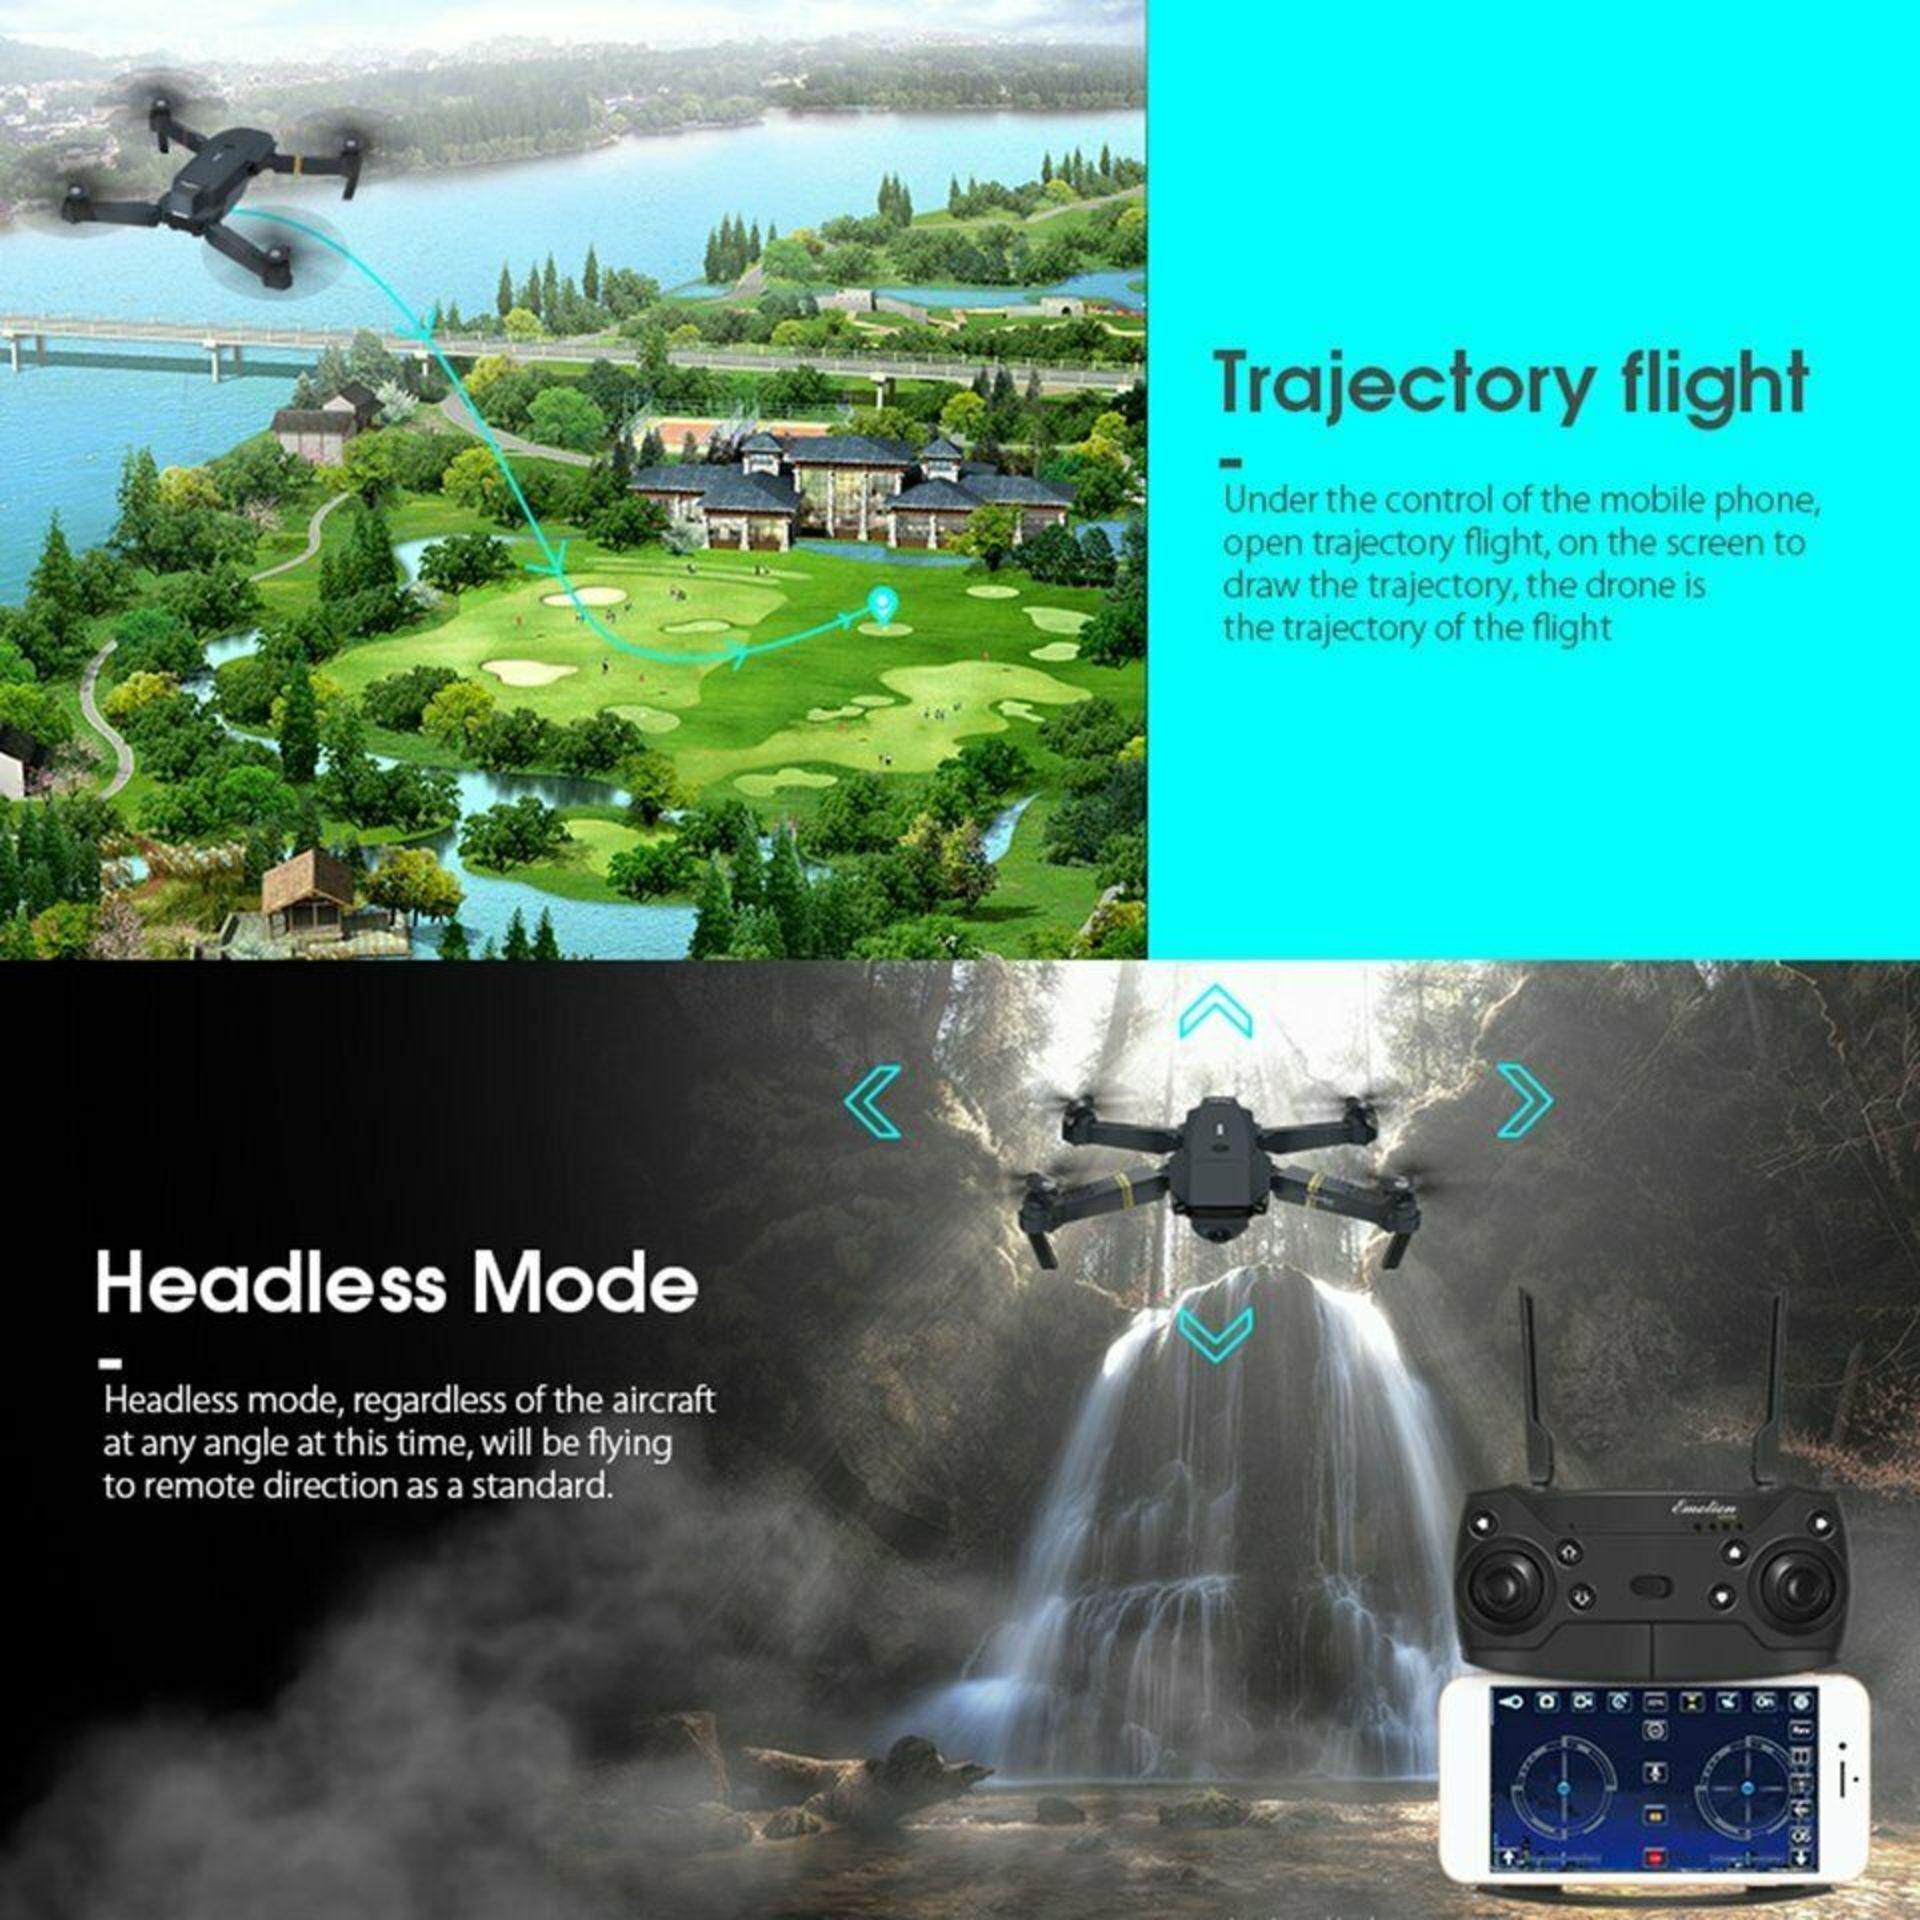 NEW & UNUSED DRONE X PRO WIFI FPV 1080P HD CAMERA FOLDABLE RC QUADCOPTER + BAG *PLUS VAT* - Image 9 of 12